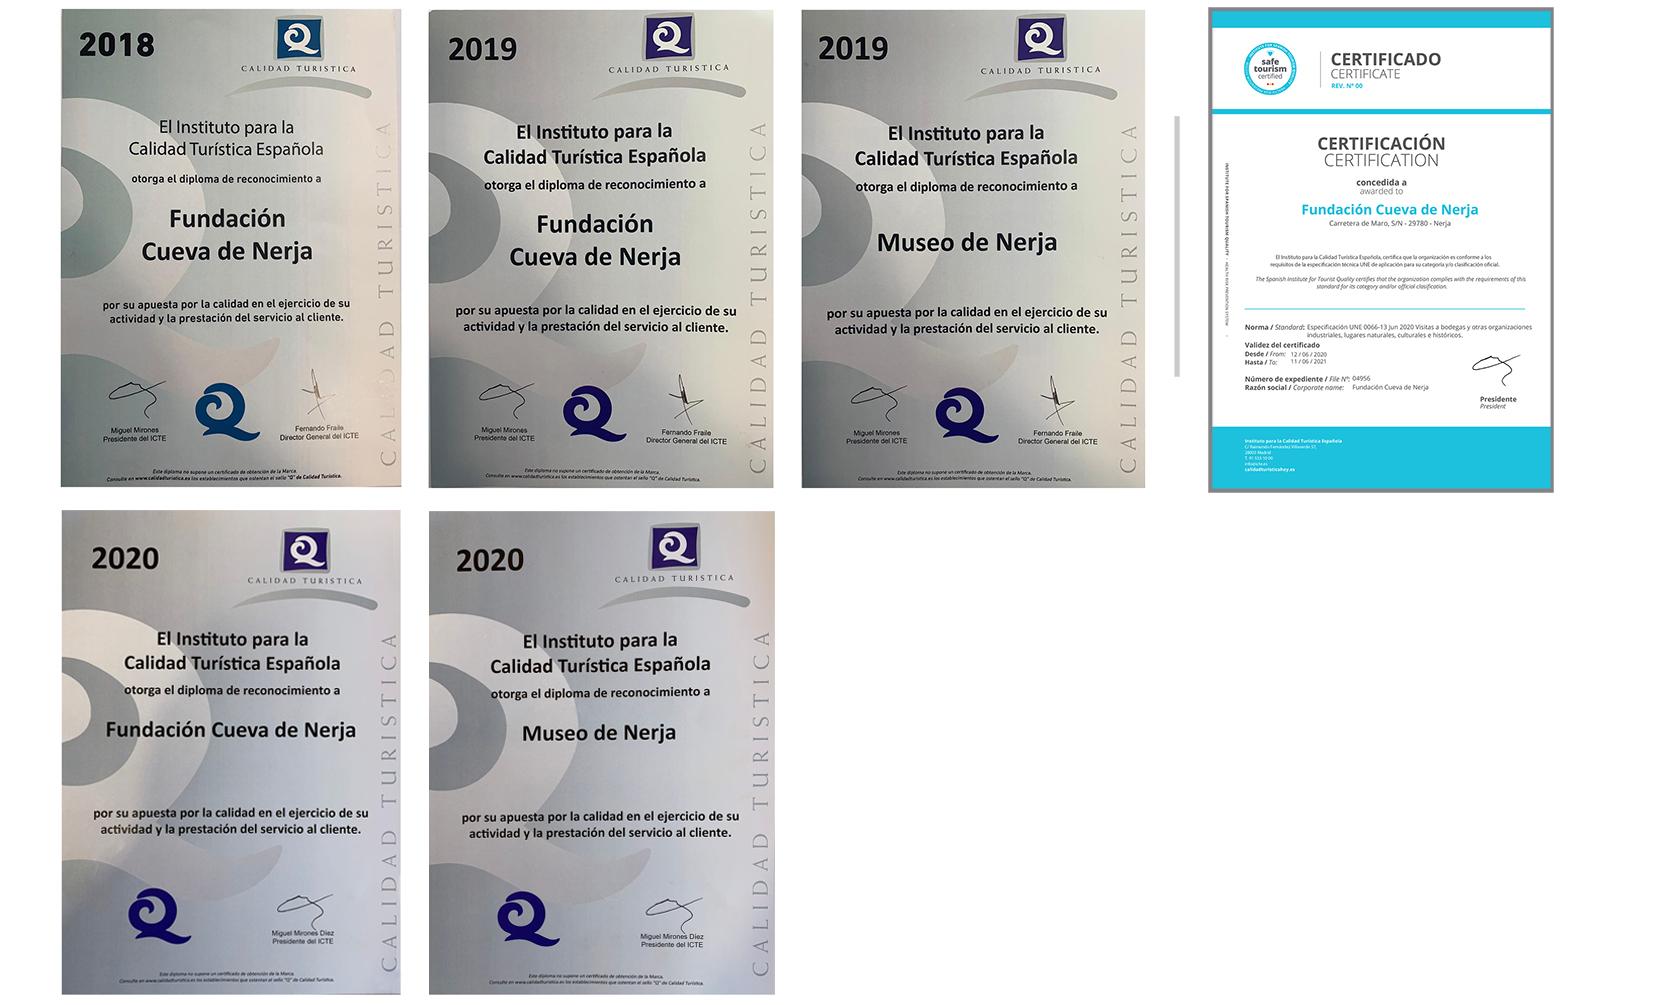 diplomas calidad Cueva de Nerja 2020